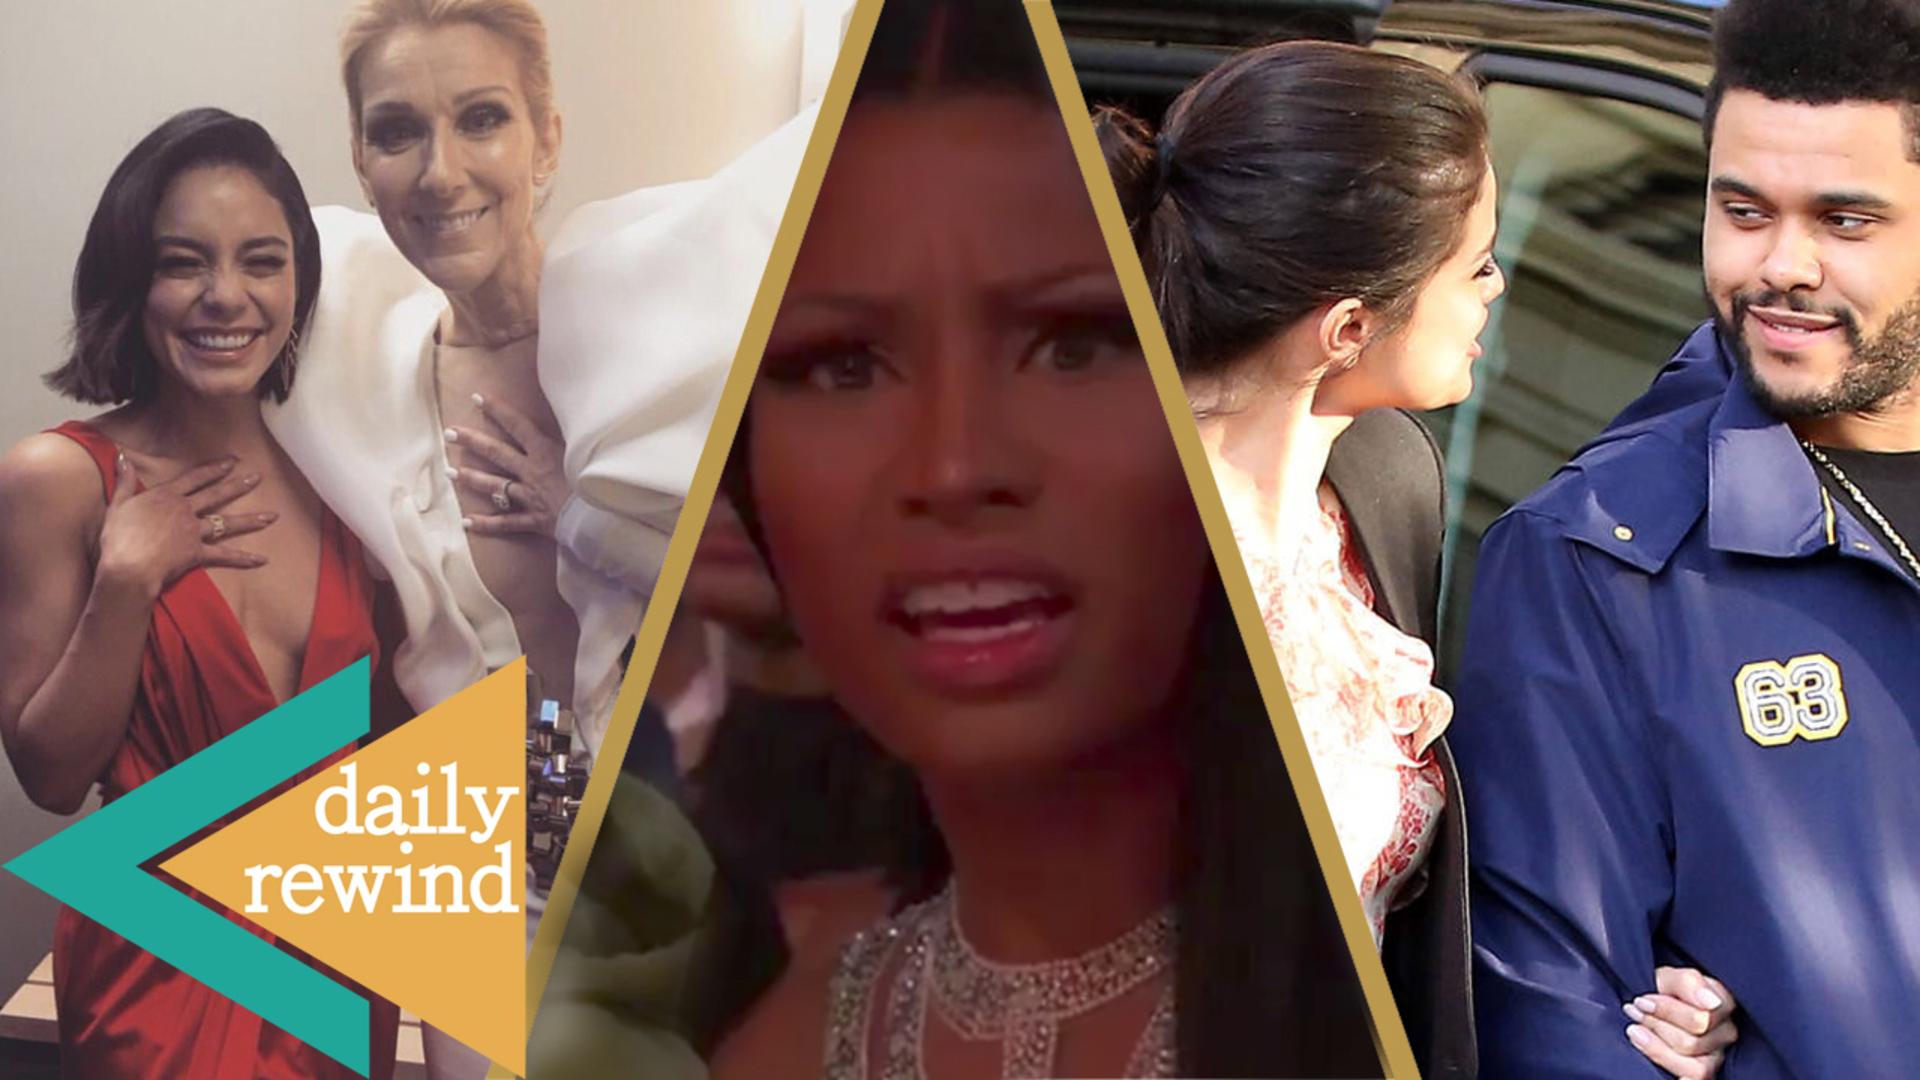 Vanessa Hudgens & Nicki Minaj Billboard Music Awards DRAMA, Selena Gomez & The Weeknd Collab? -DR